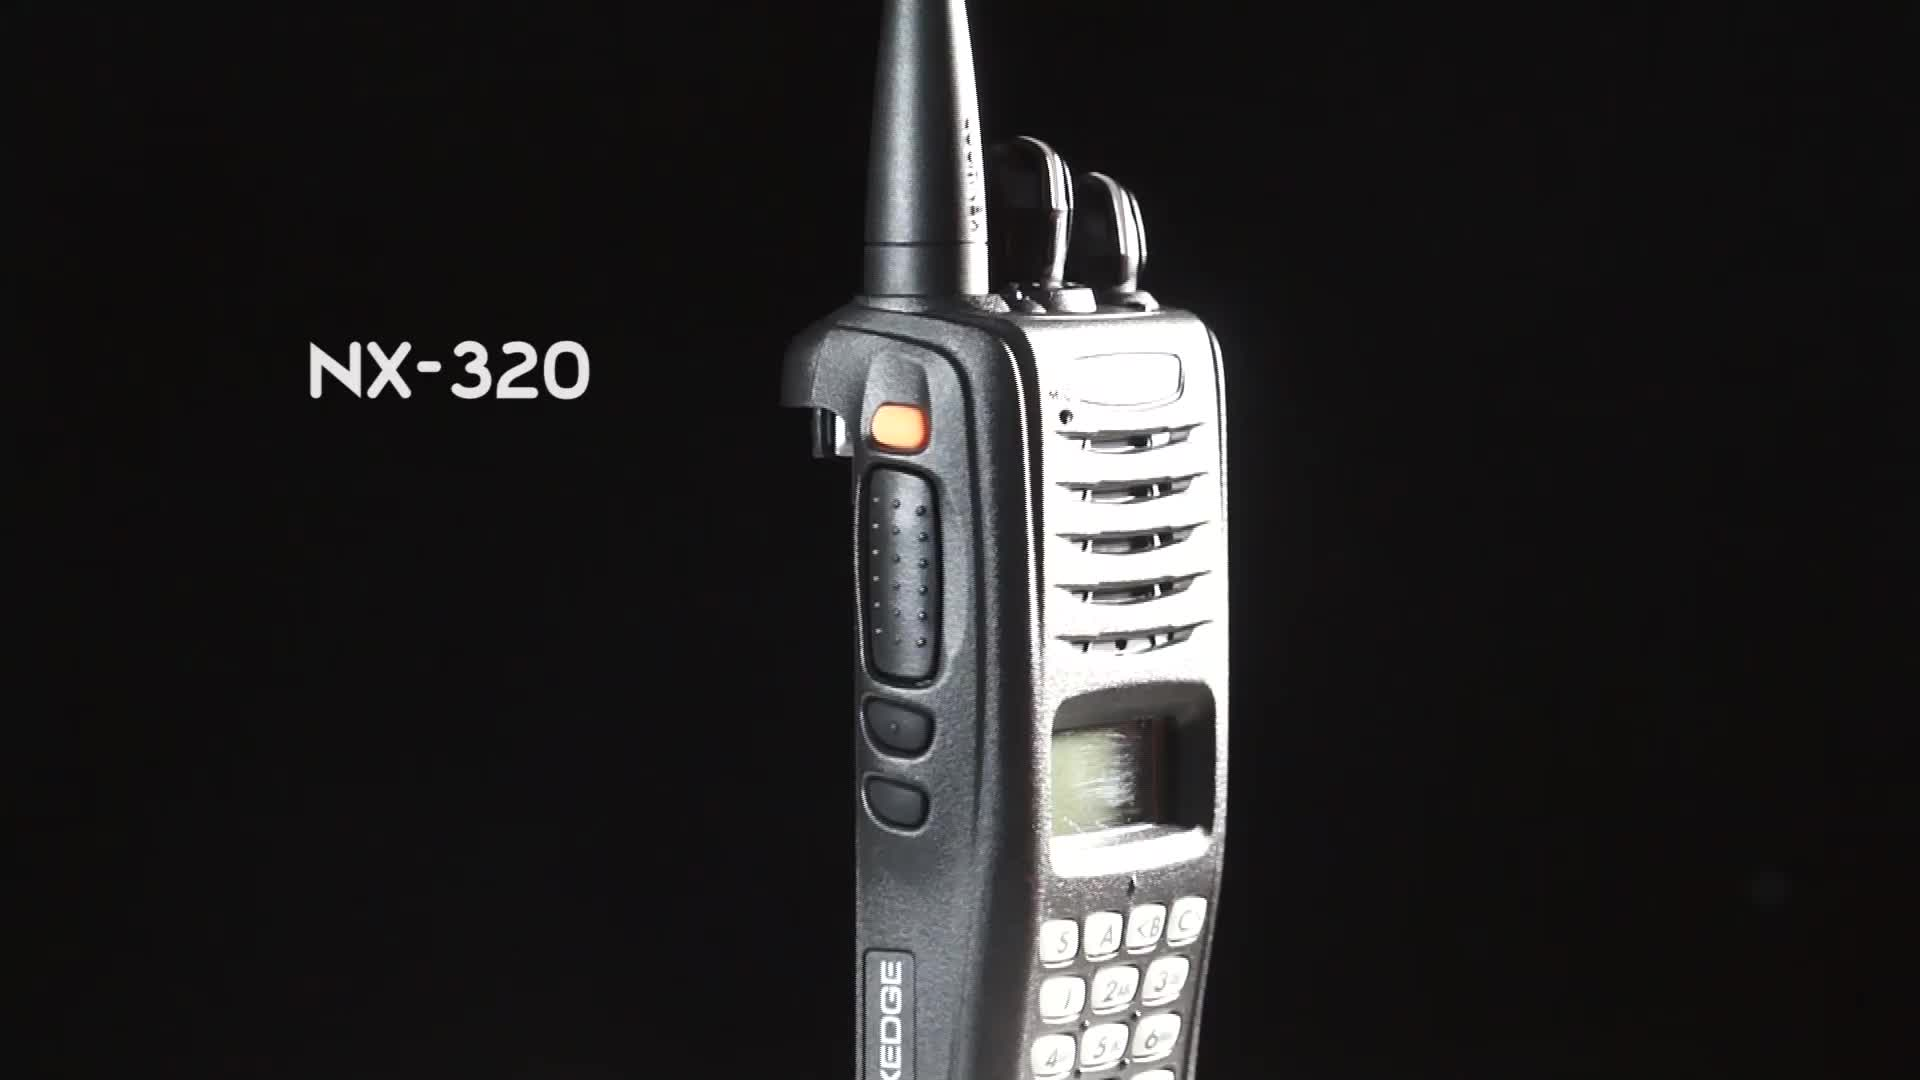 Kenwood digital wireless walkie talkie NX-220/NX-320 with full keypad